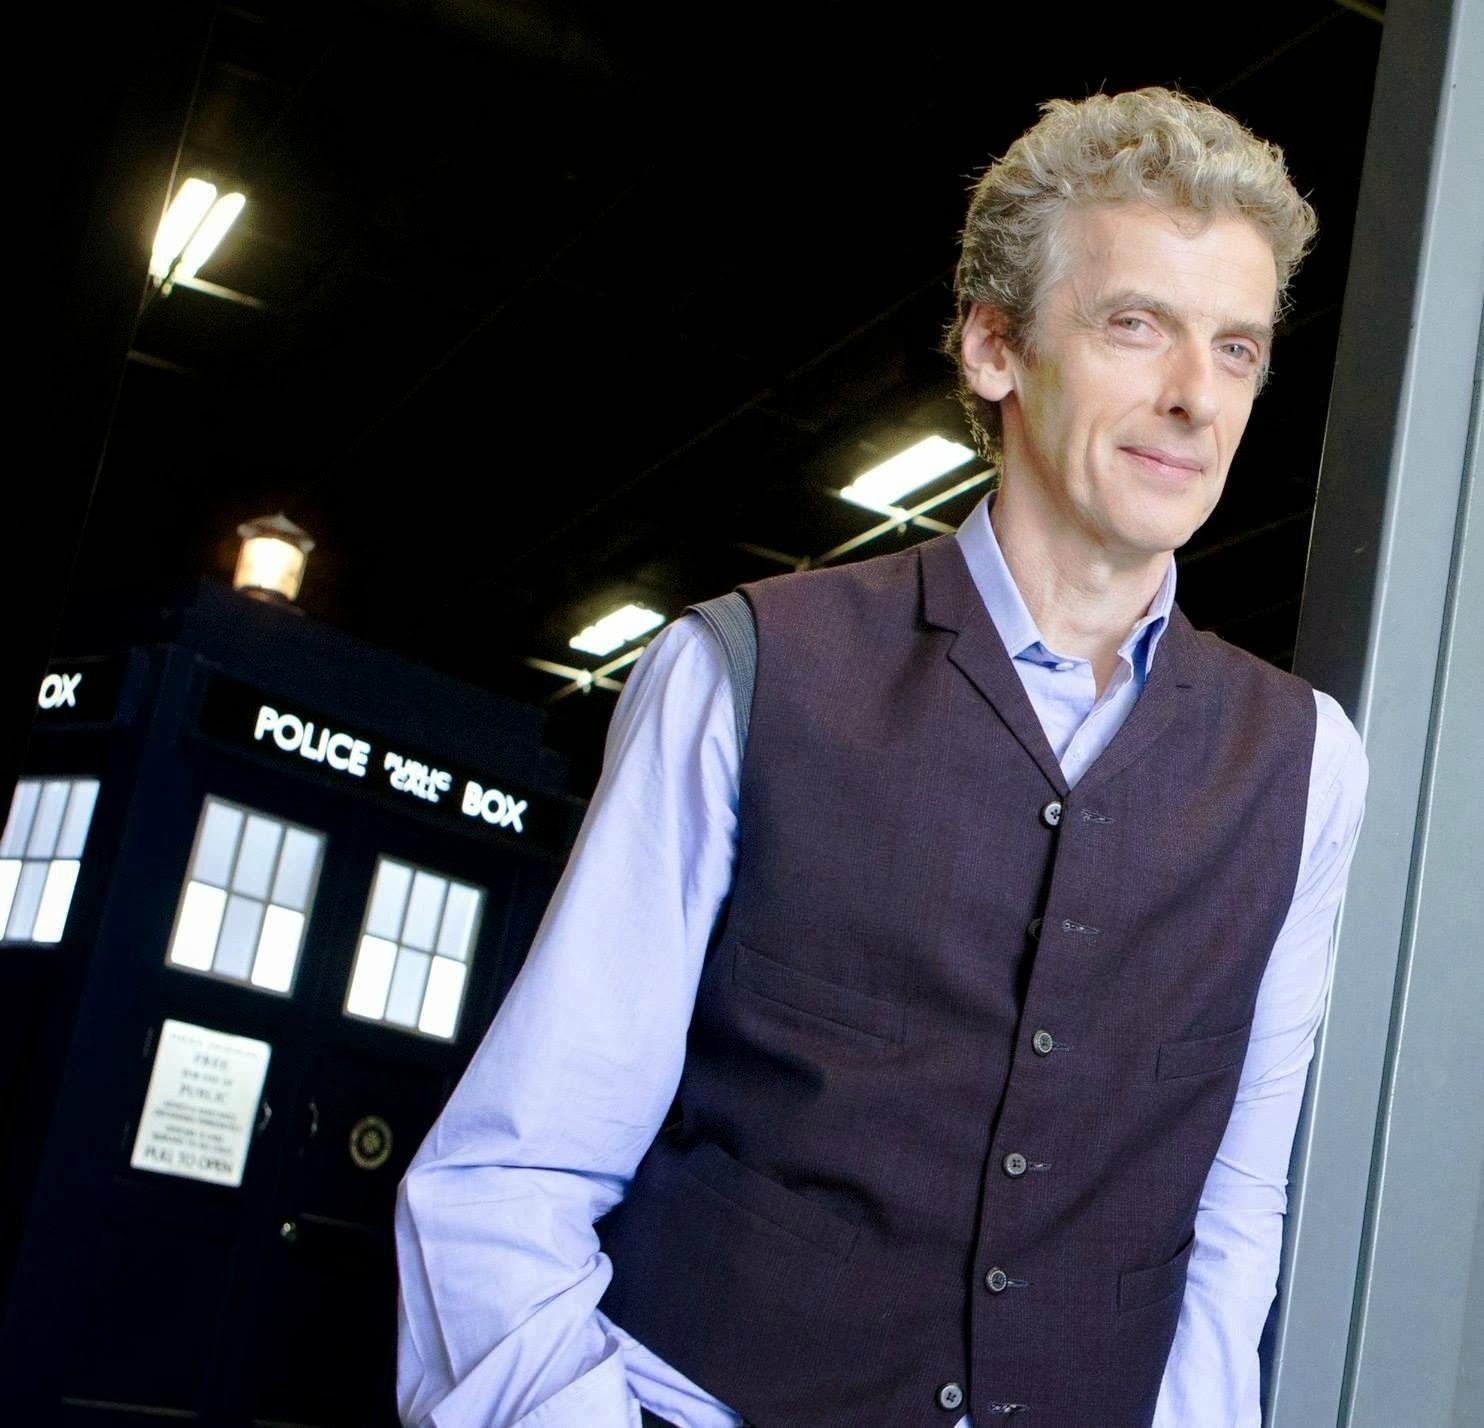 steven-moffat-describes-new-doctor-as-crazy-dangerous-and-difficult-social.jpg